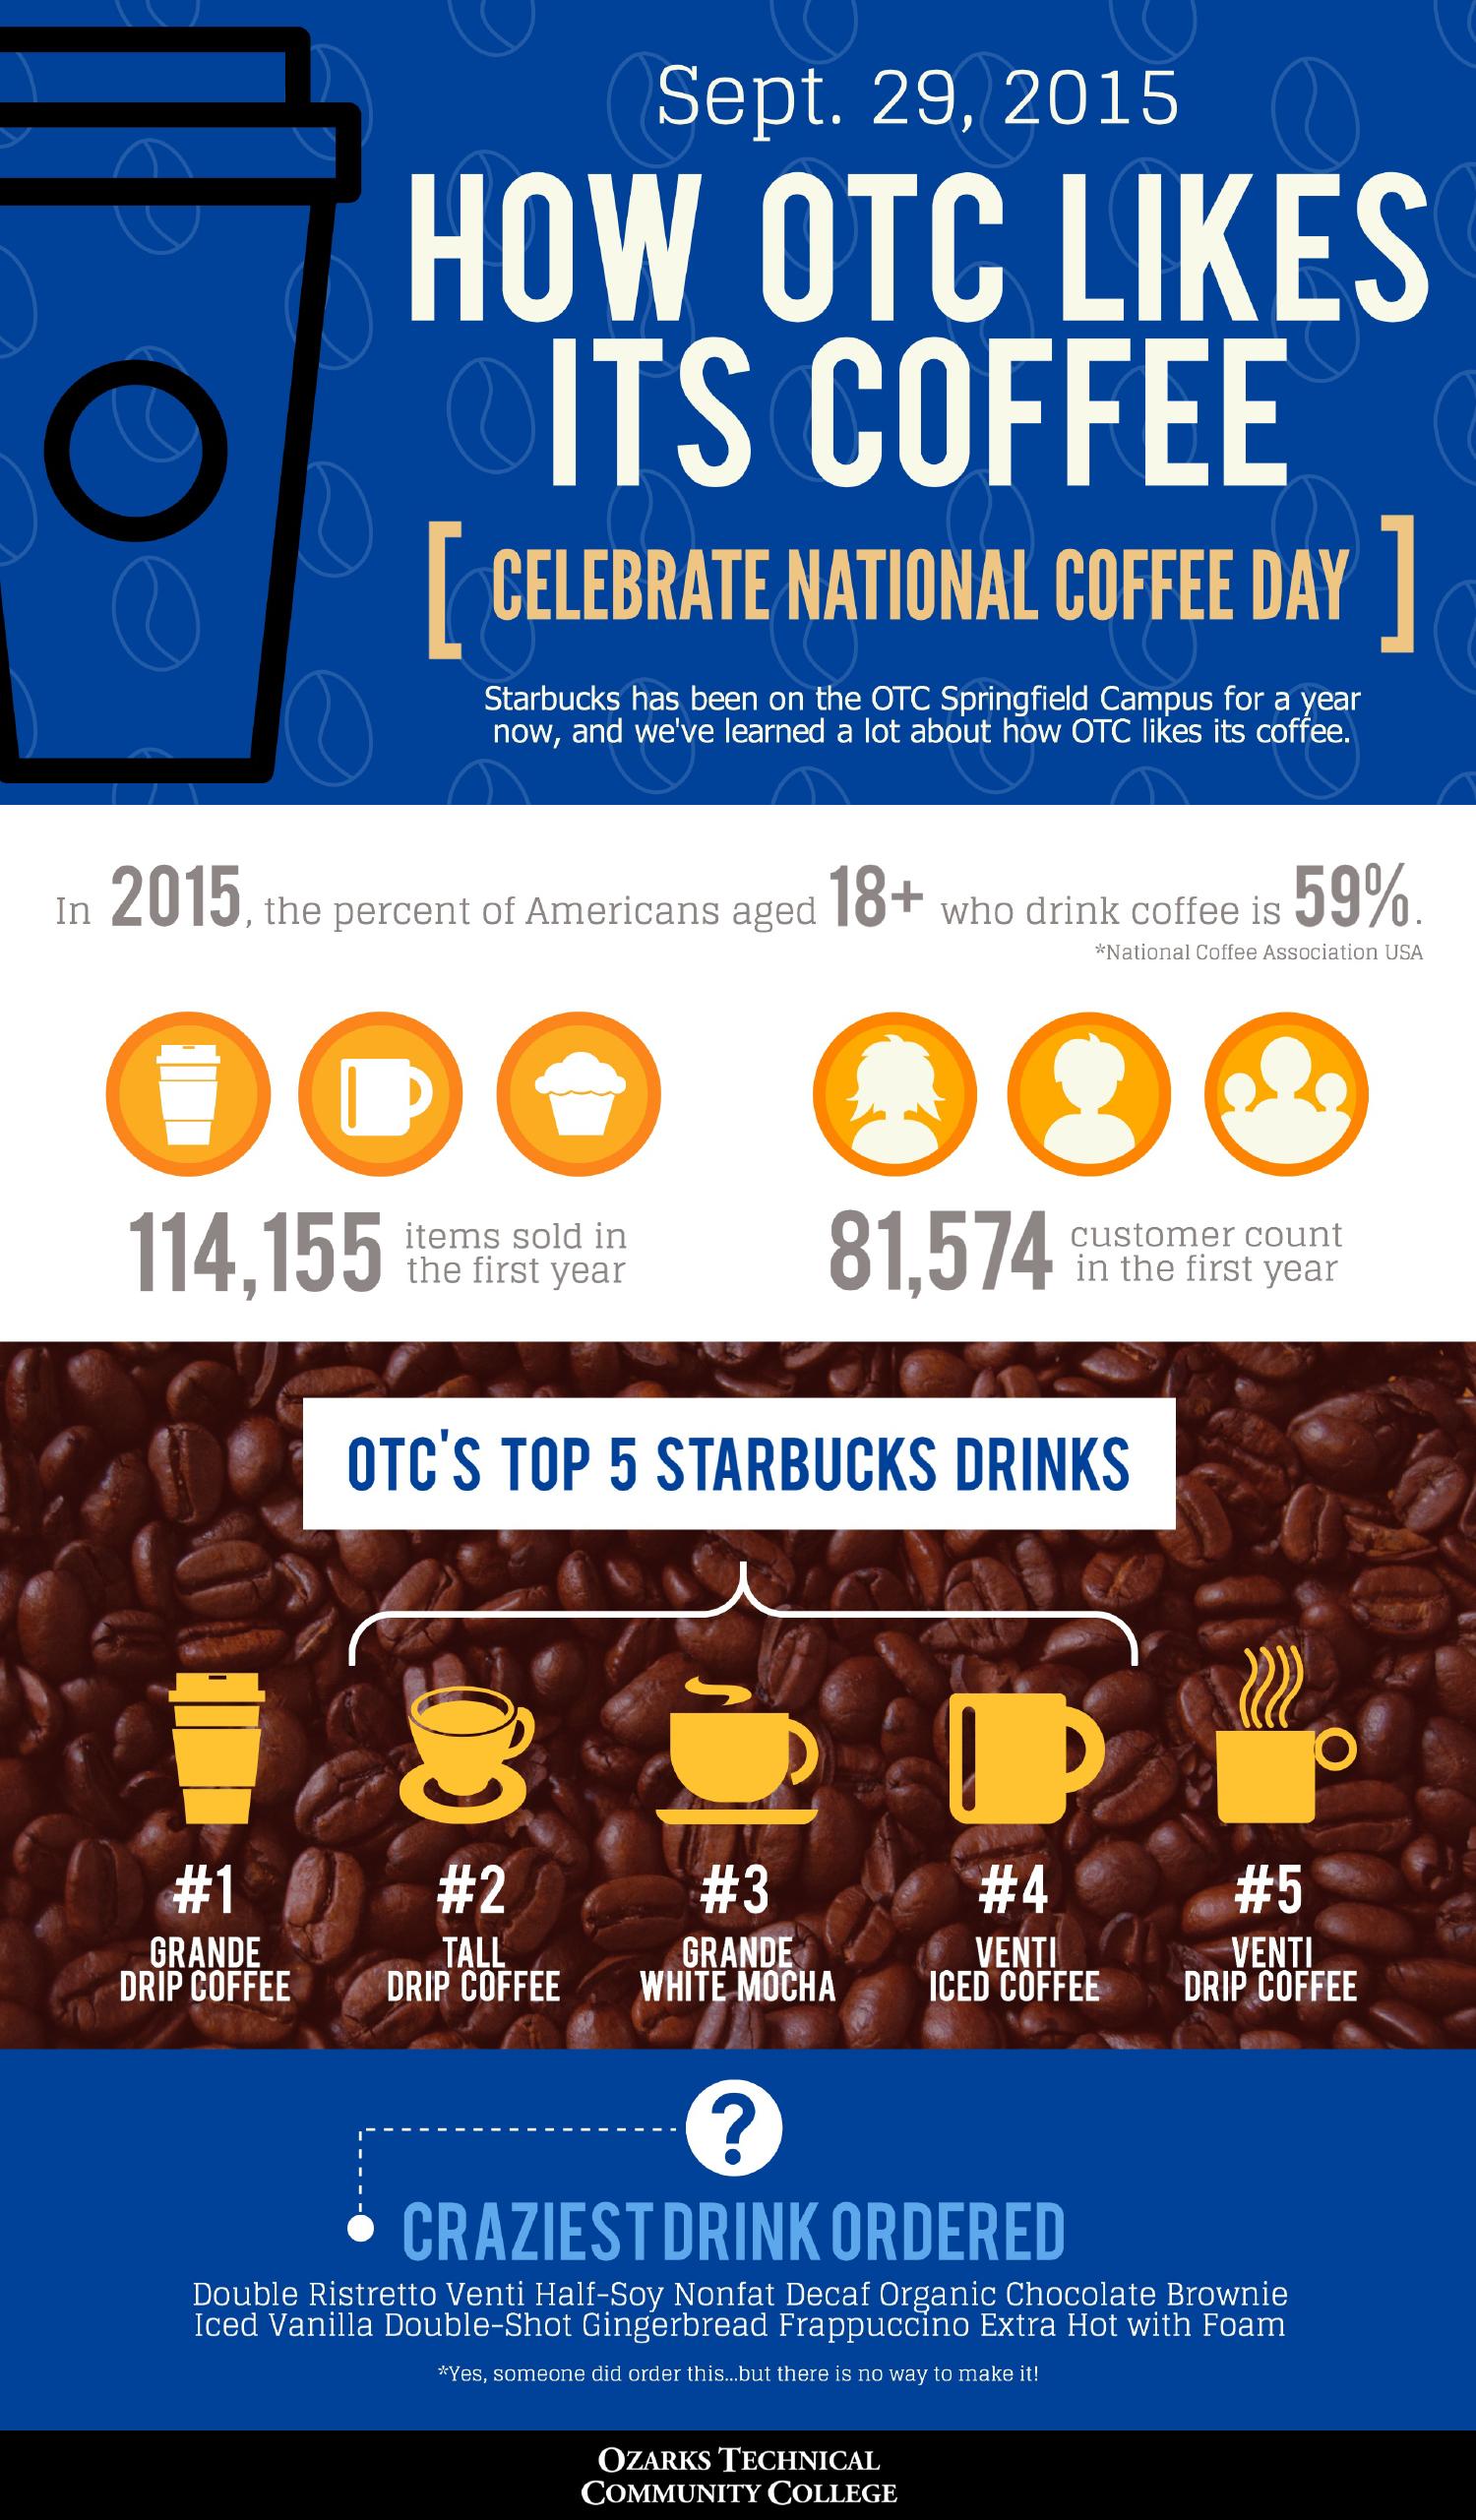 Starbucks – How OTC Likes its Coffee